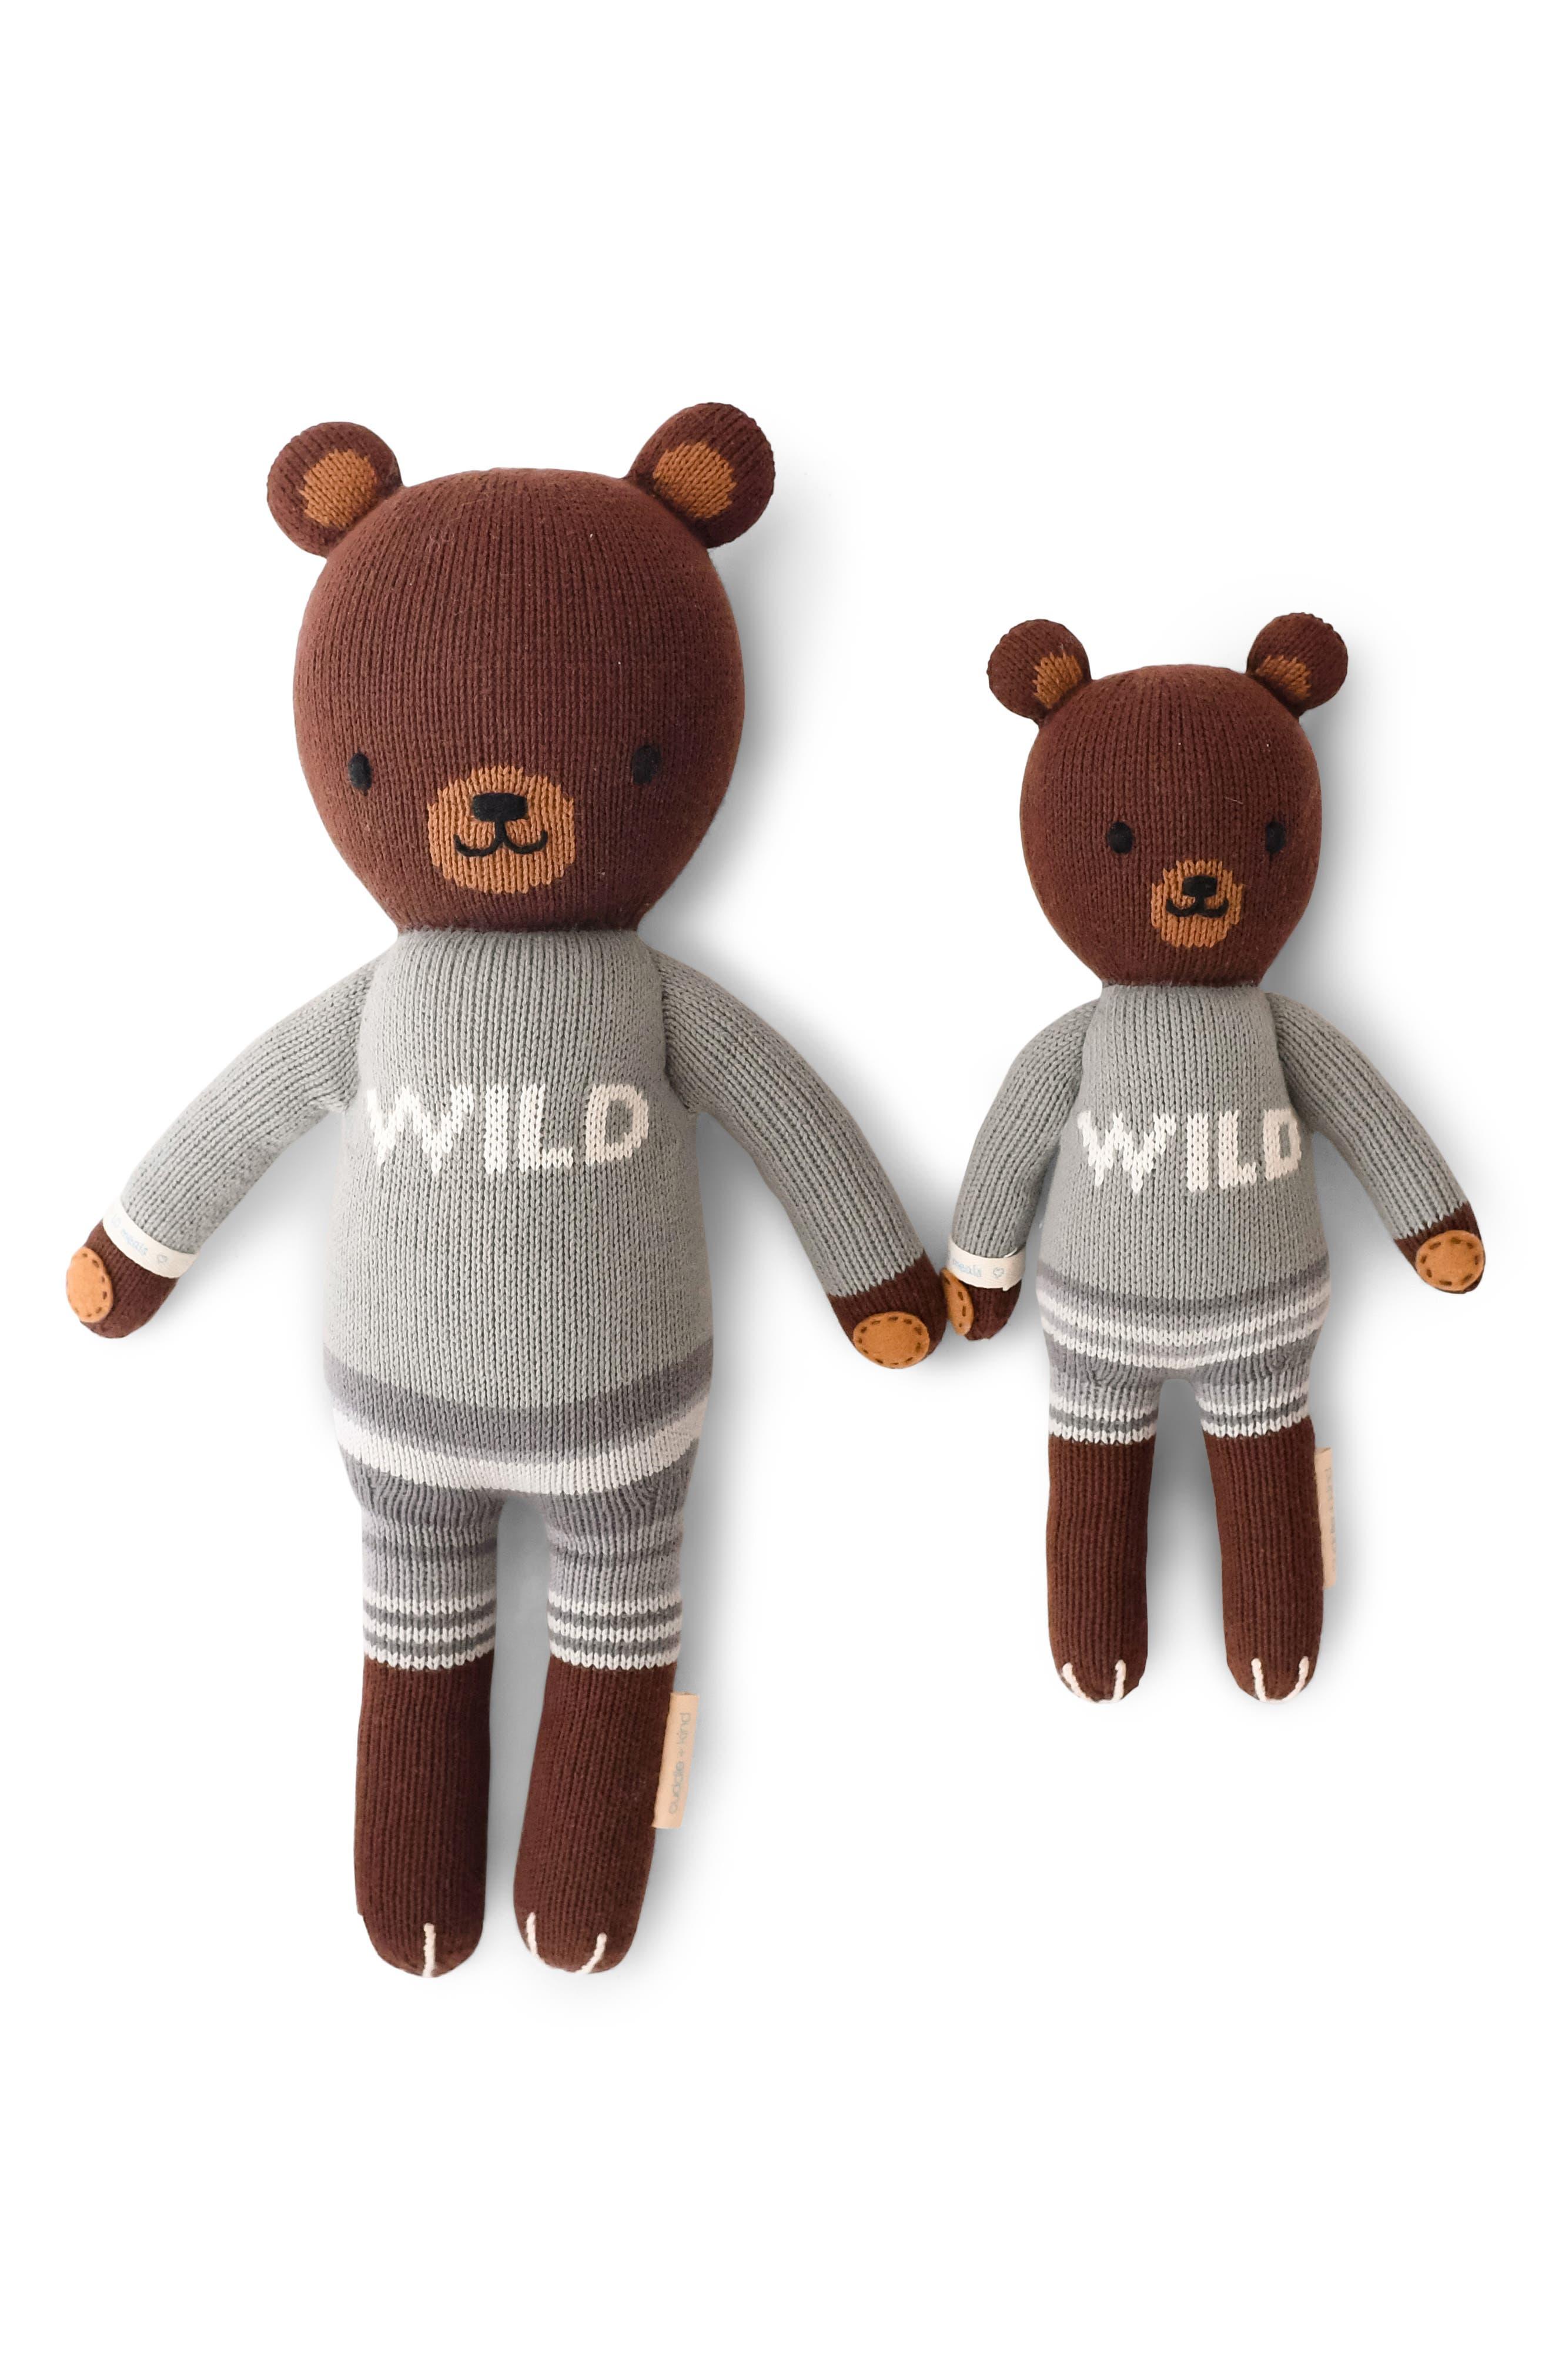 cuddle + kind Oliver the Bear Stuffed Animal,                             Main thumbnail 1, color,                             200